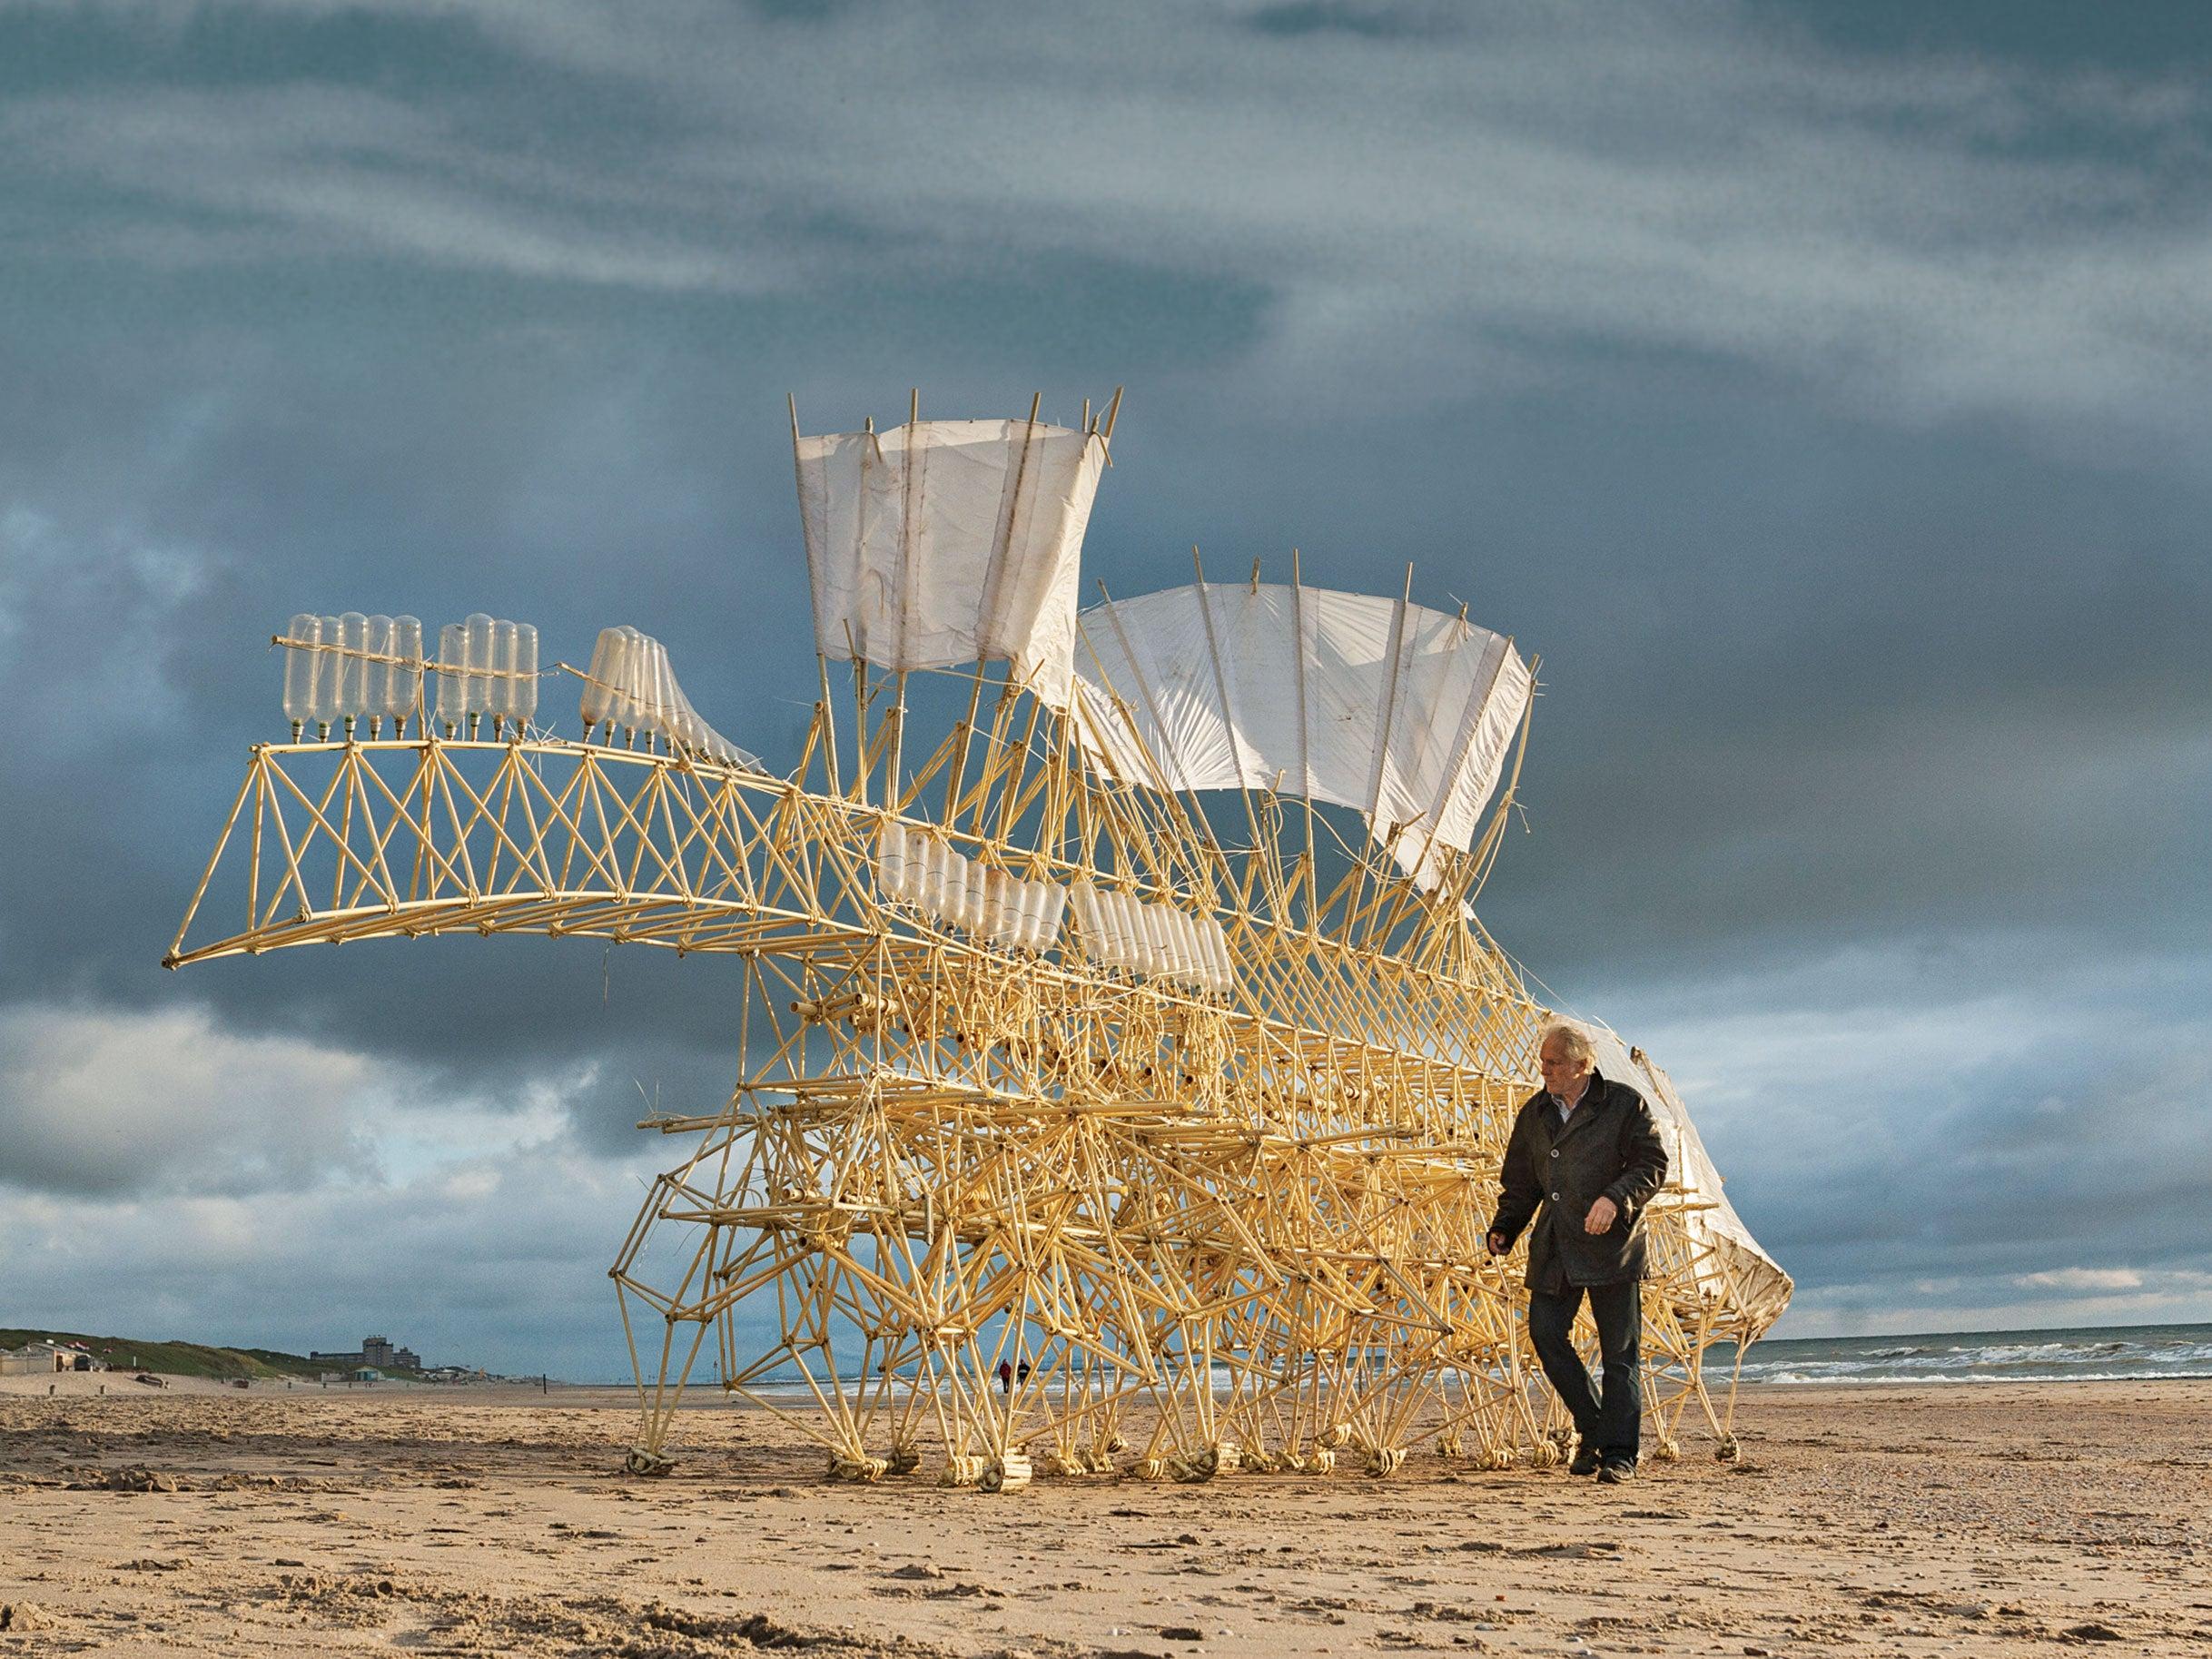 'Living' Strandbeest Sculptures Tour U.S. Museums